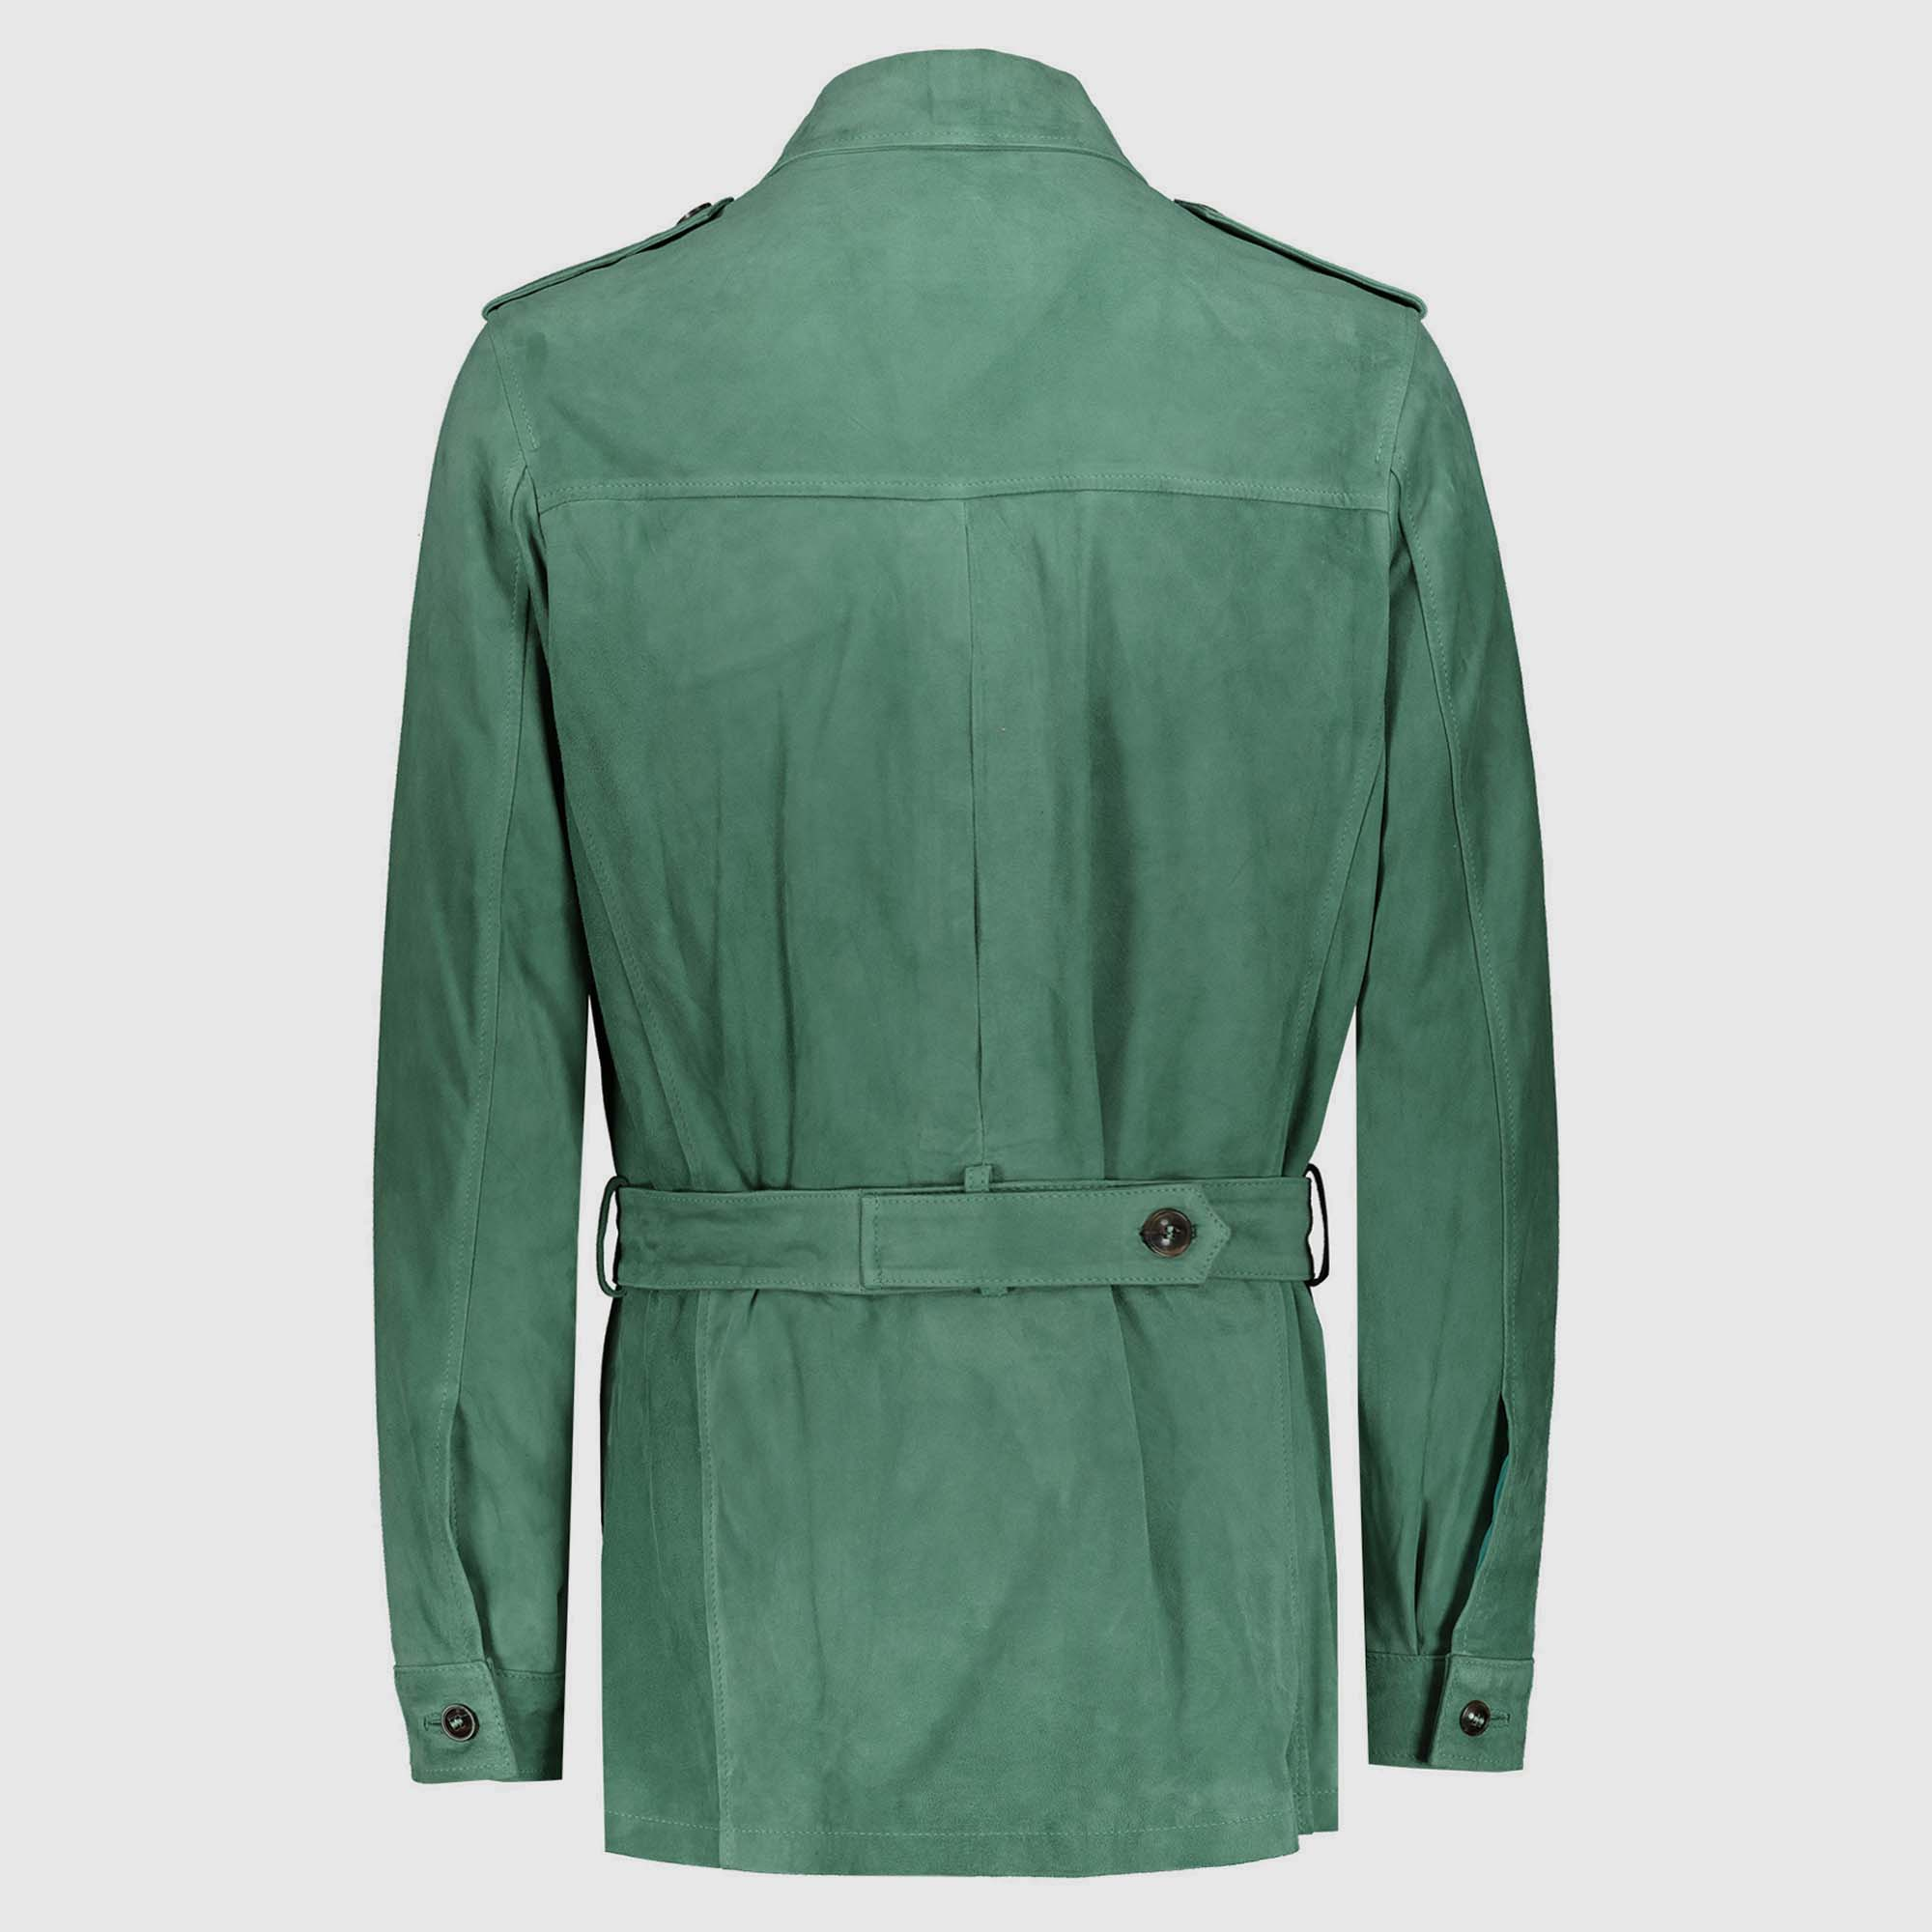 Atacama's Safari green Jacket